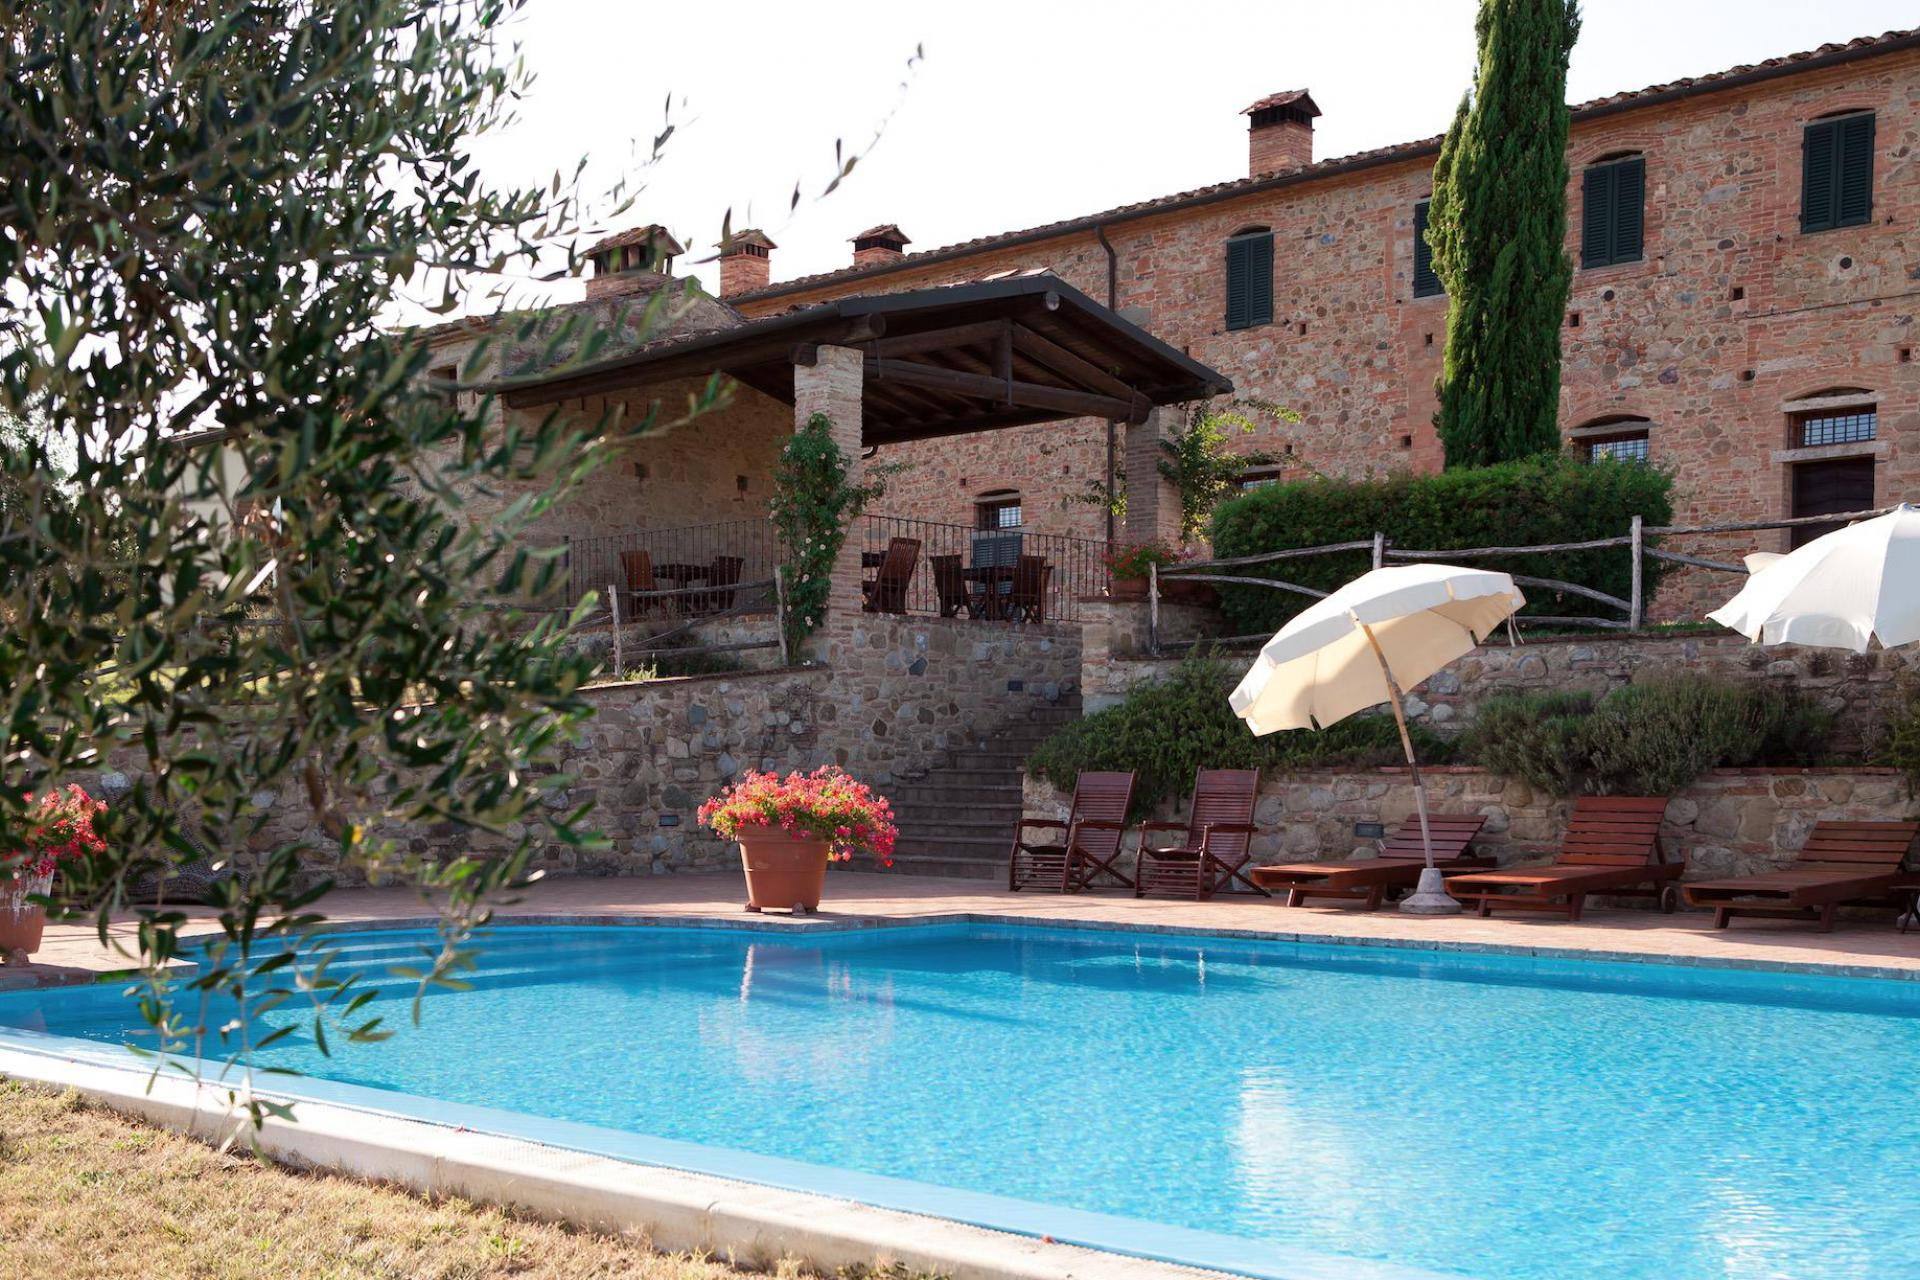 Agriturismo Tuscany Biological agriturismo near Montepulciano in Tuscany